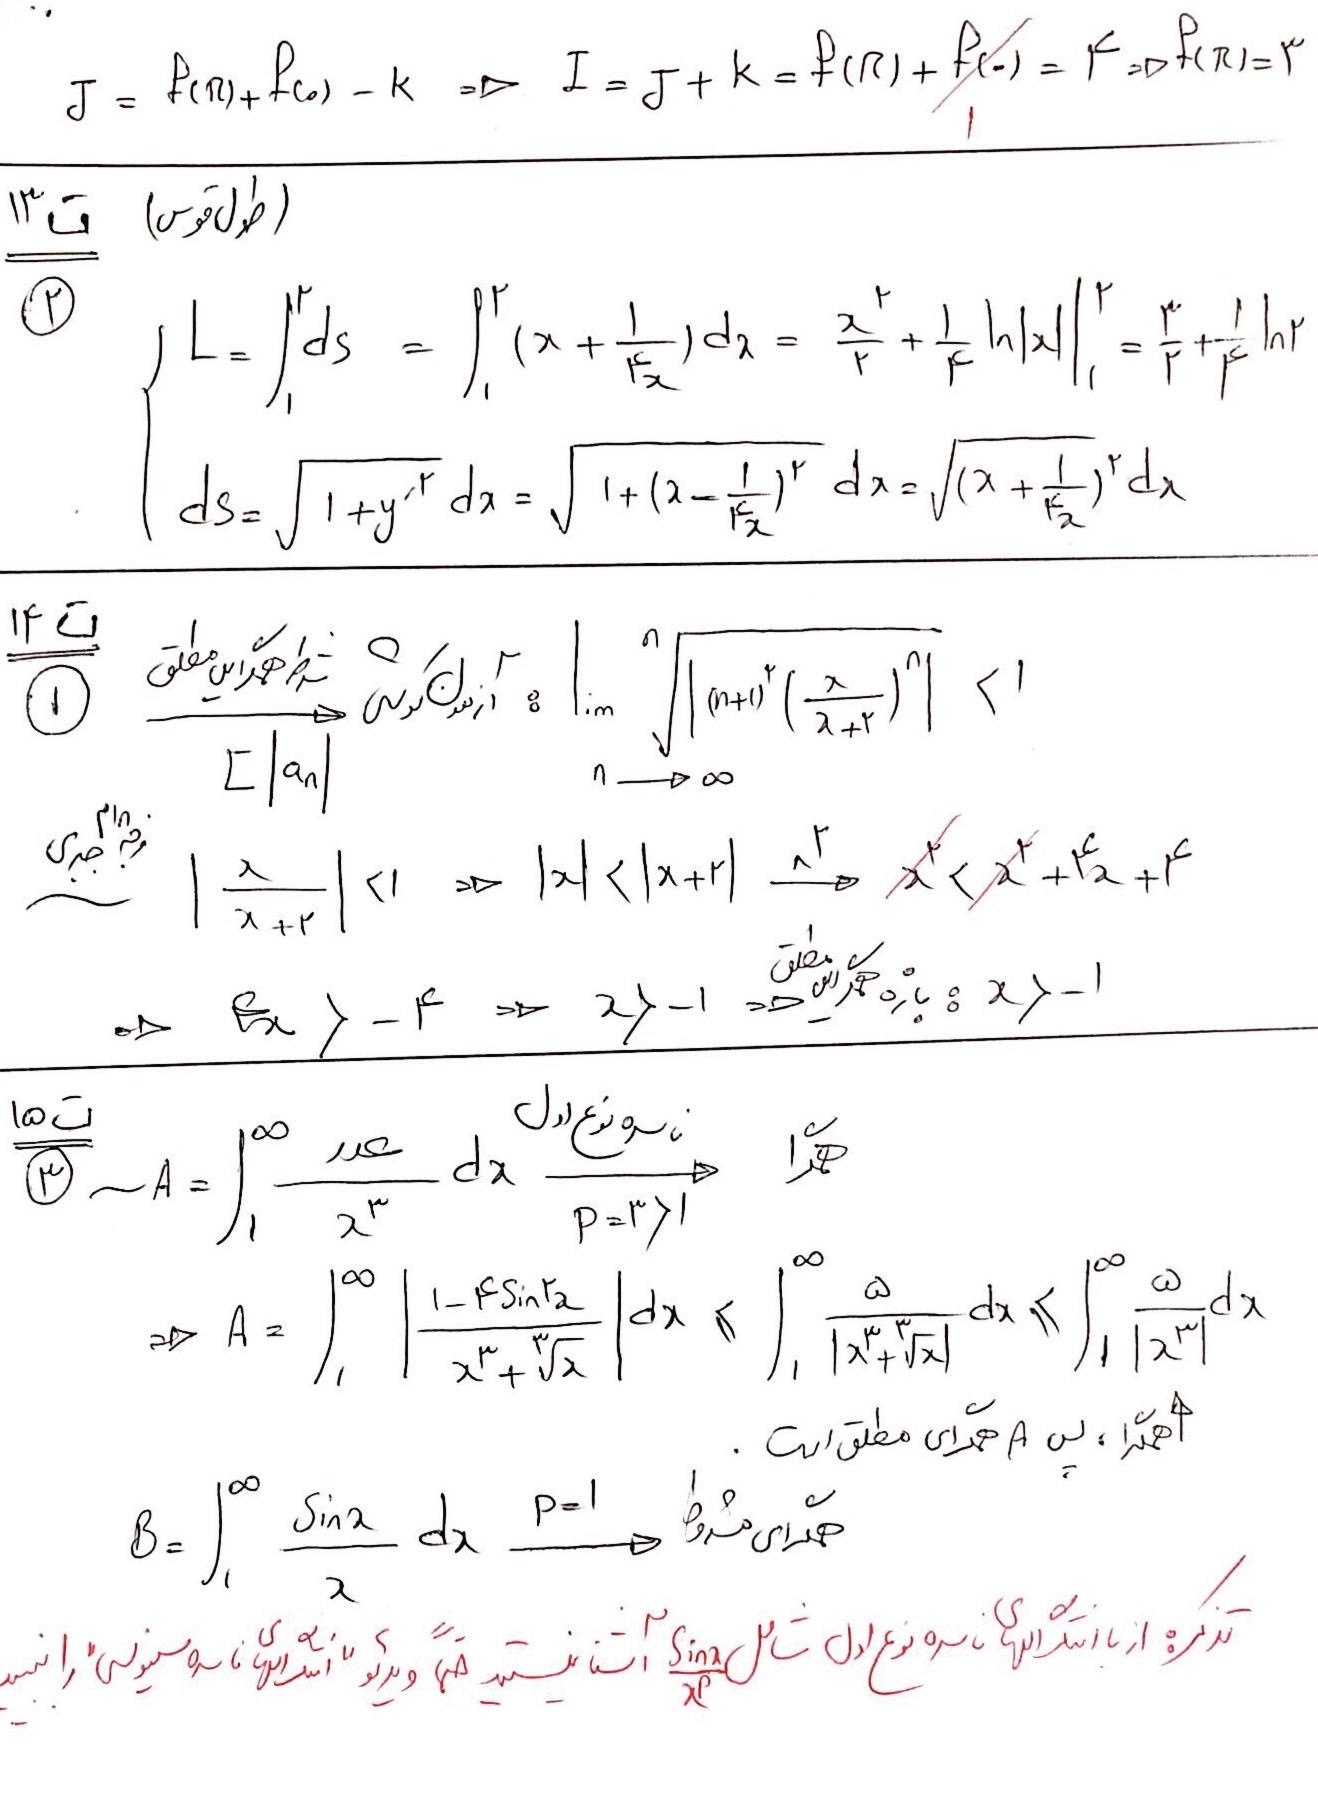 پاسخ تشریحی ریاضی کنکور ارشد 96